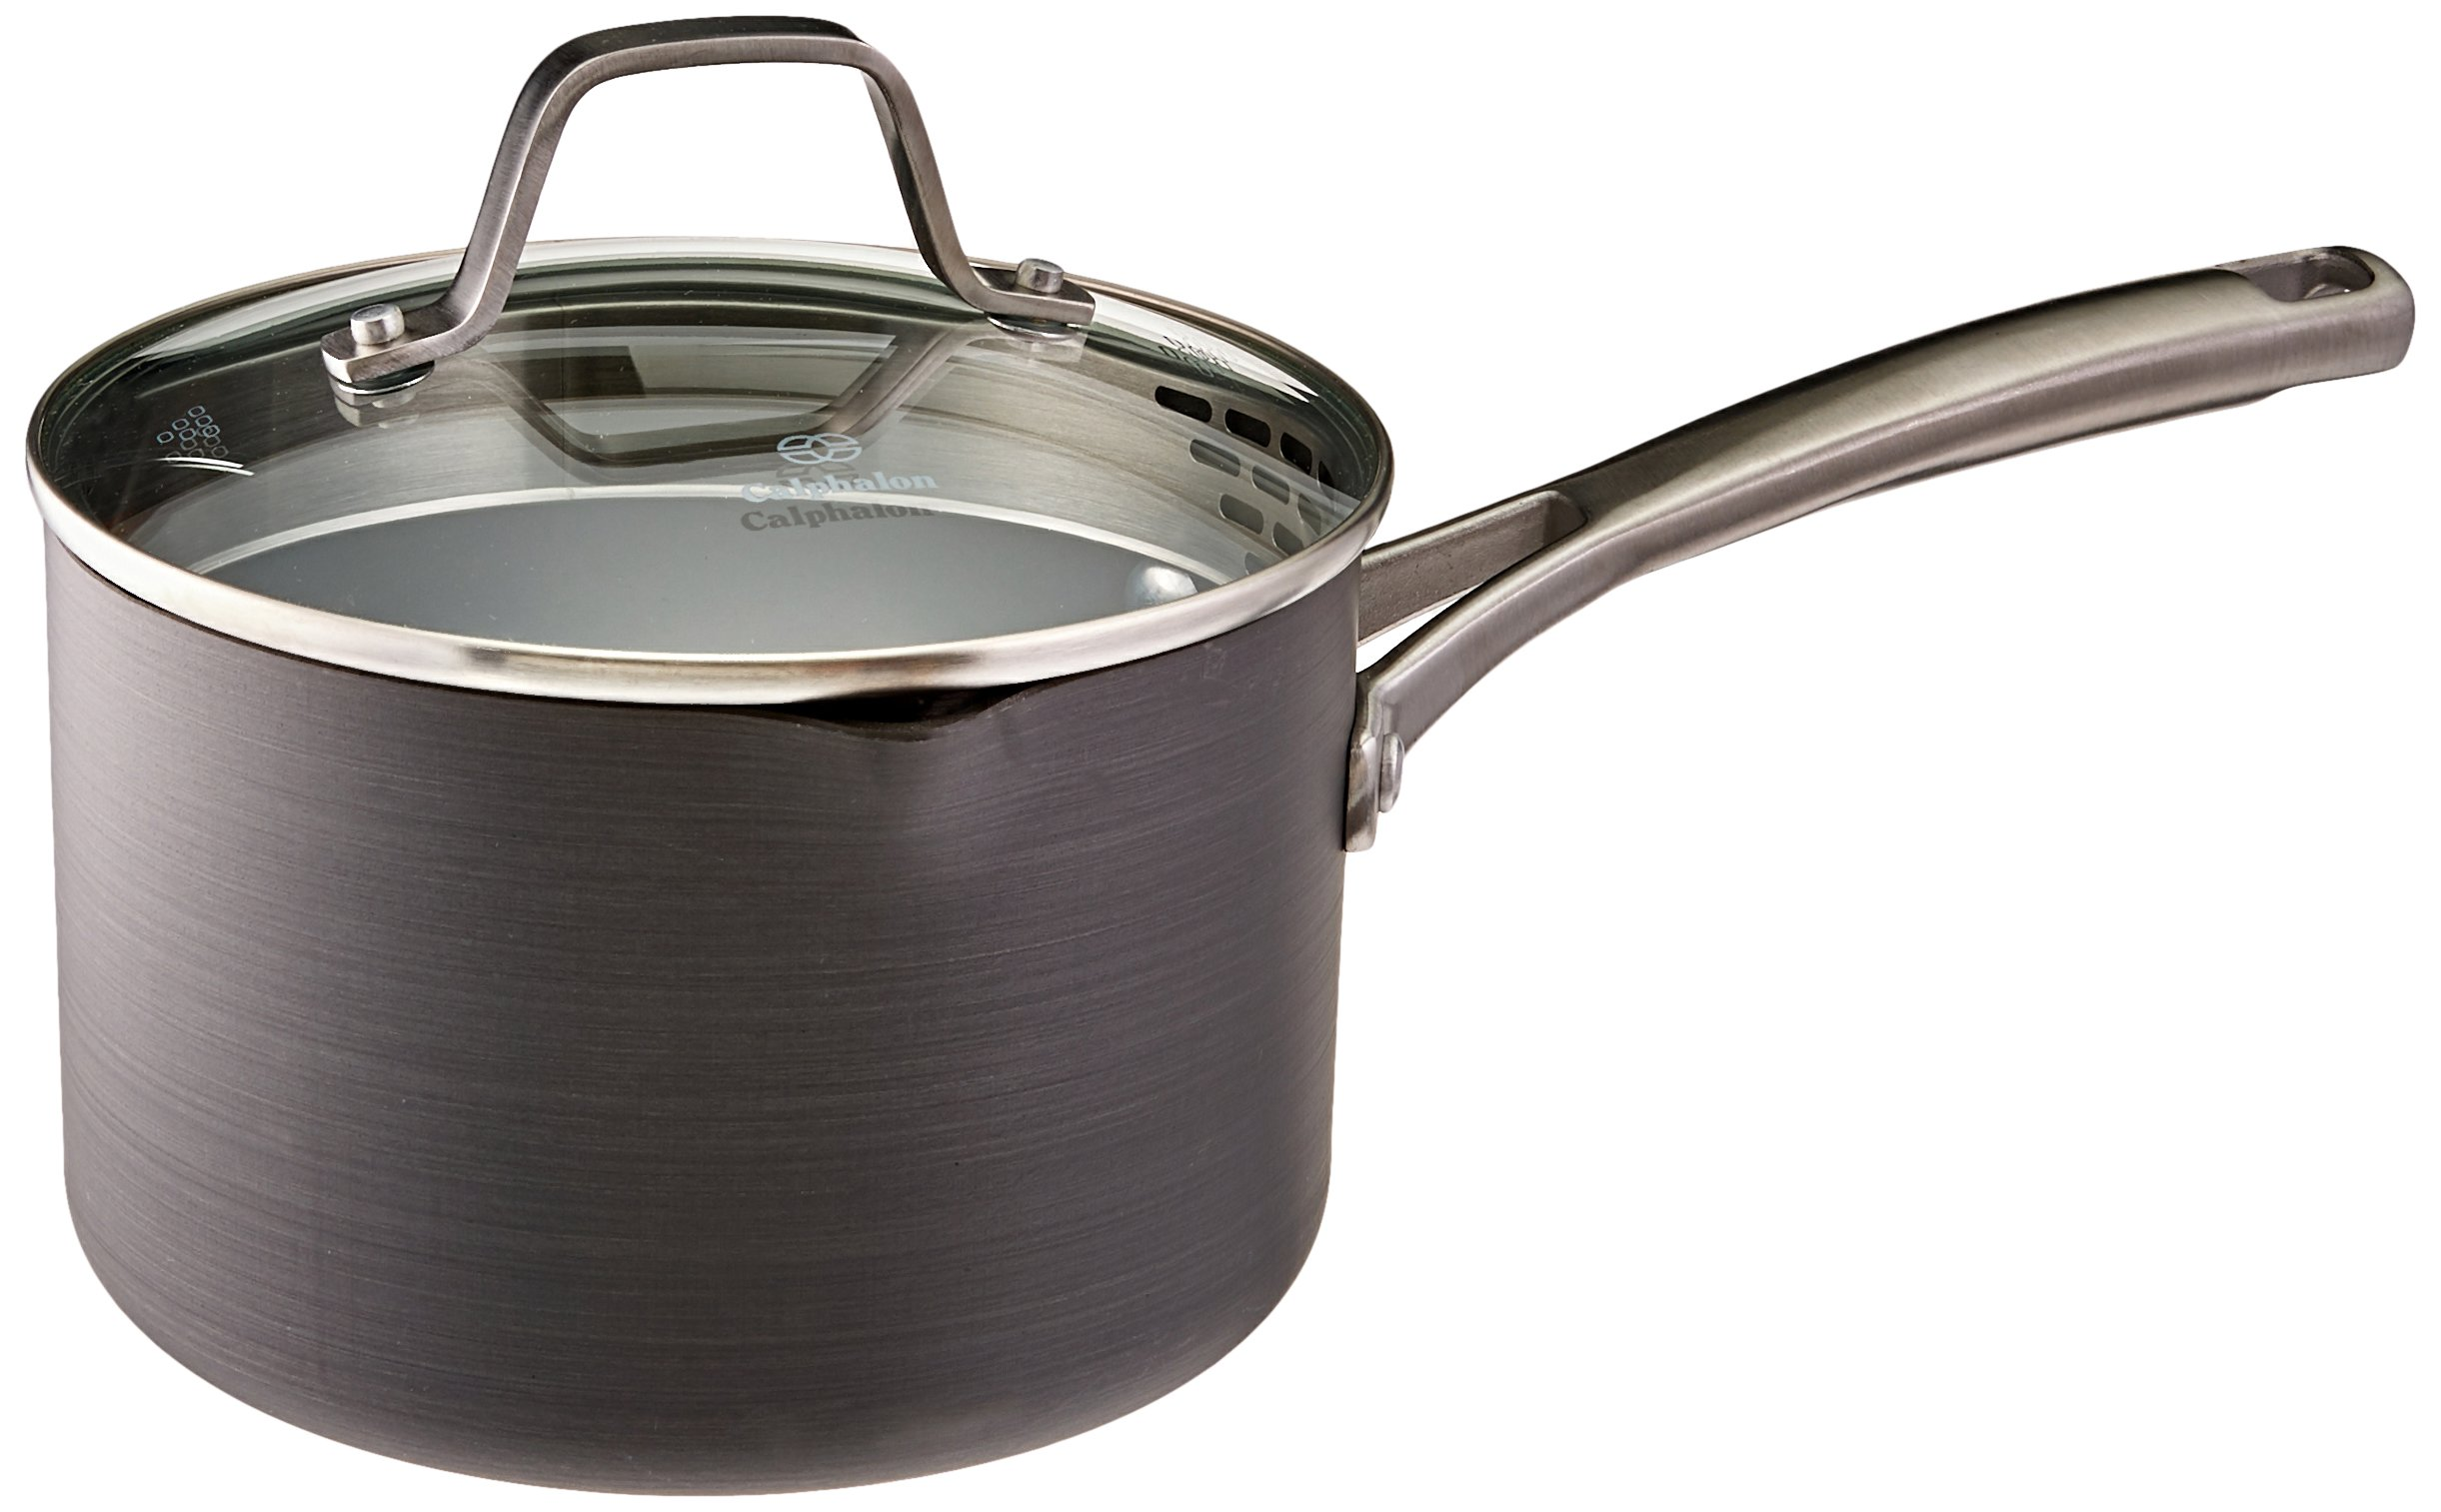 Calphalon Classic Nonstick Sauce Pan with Cover, 2.5 Quart, Grey